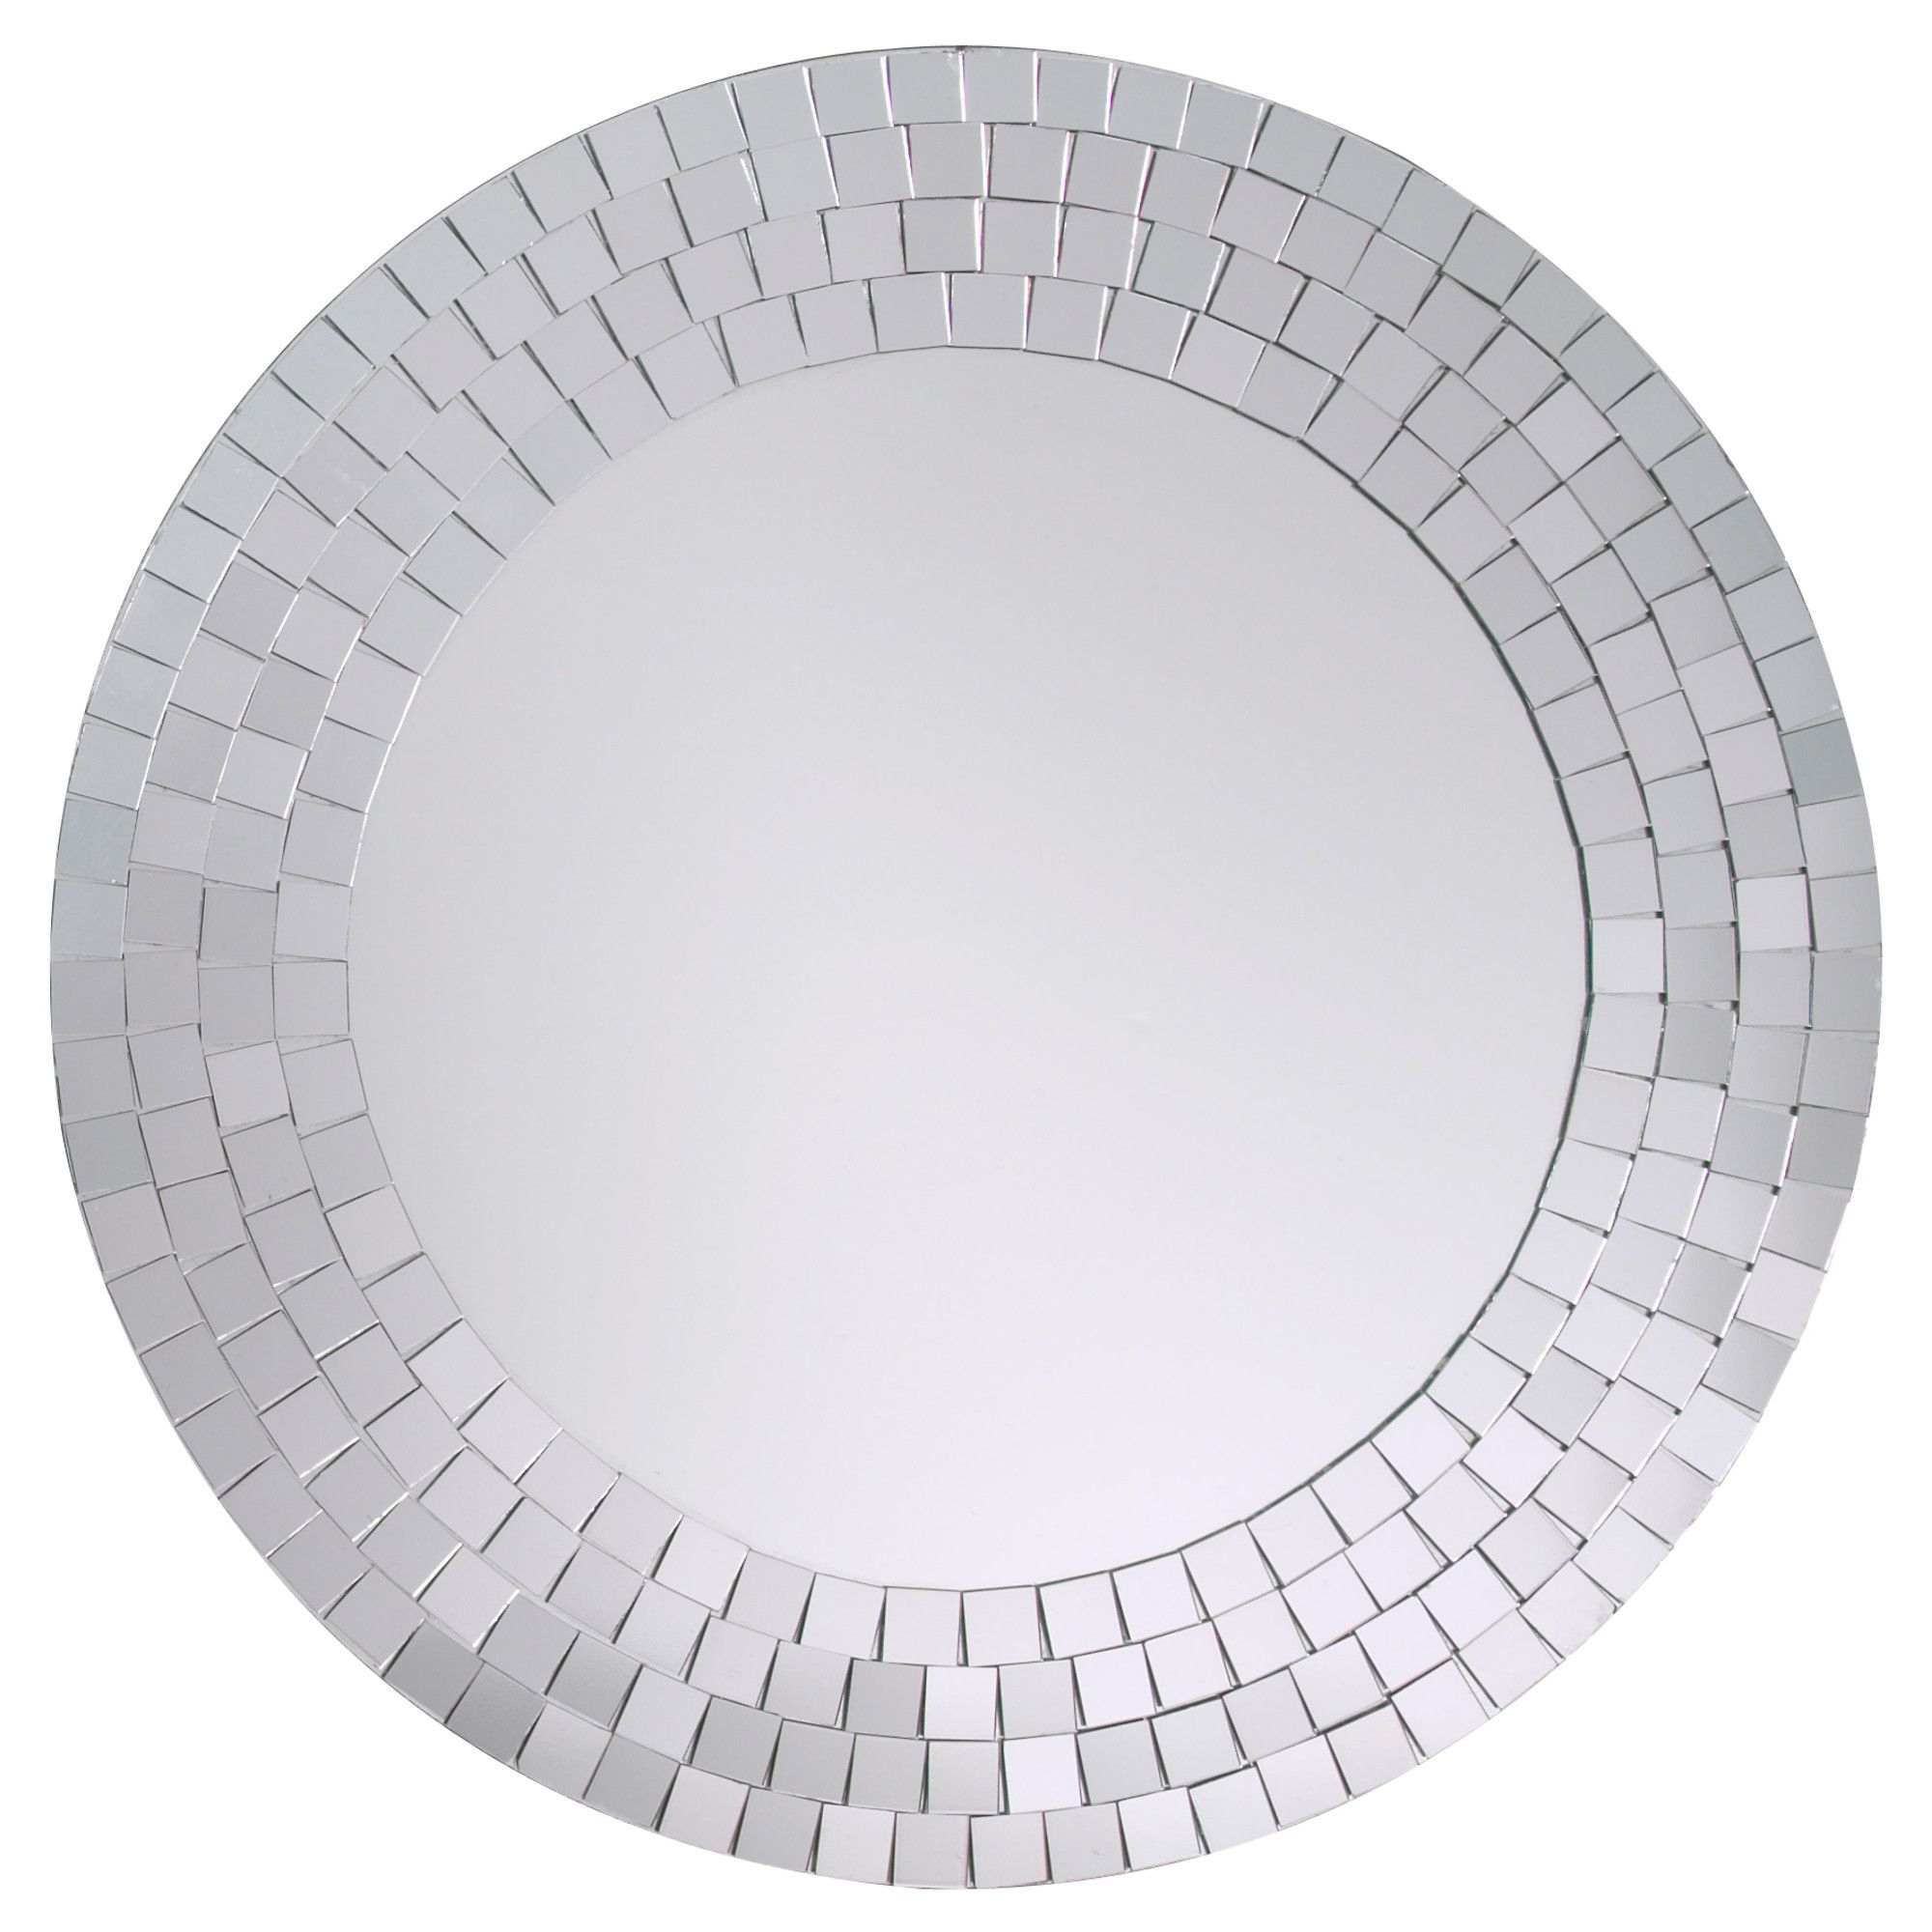 Ikea Round Wall Mirrors Regarding Famous Ikea Tranby Mirror, Mirror Glass $ (View 2 of 20)